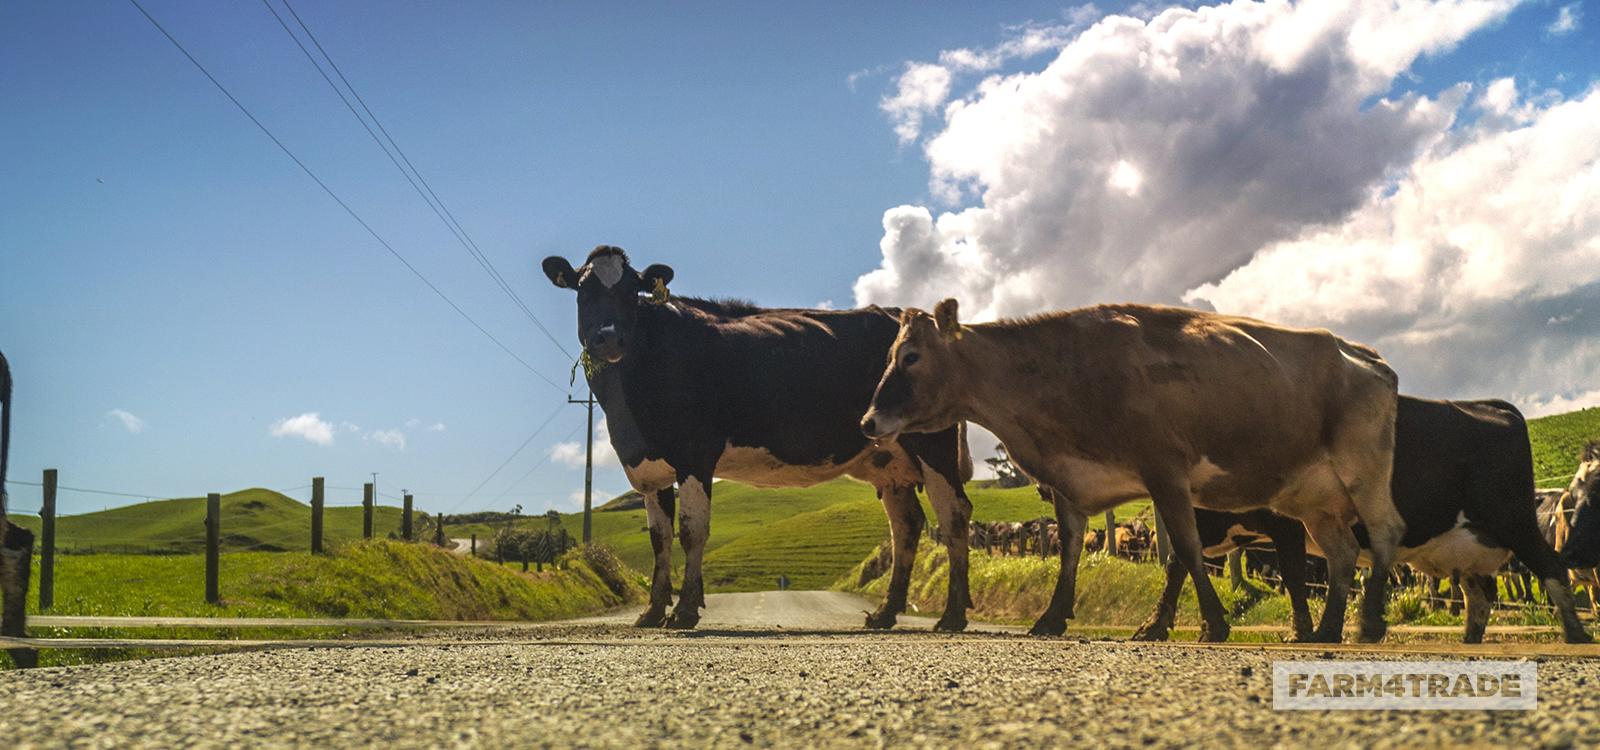 Farm4Trade Blog - Is coronavirus a threat for livestock animals?